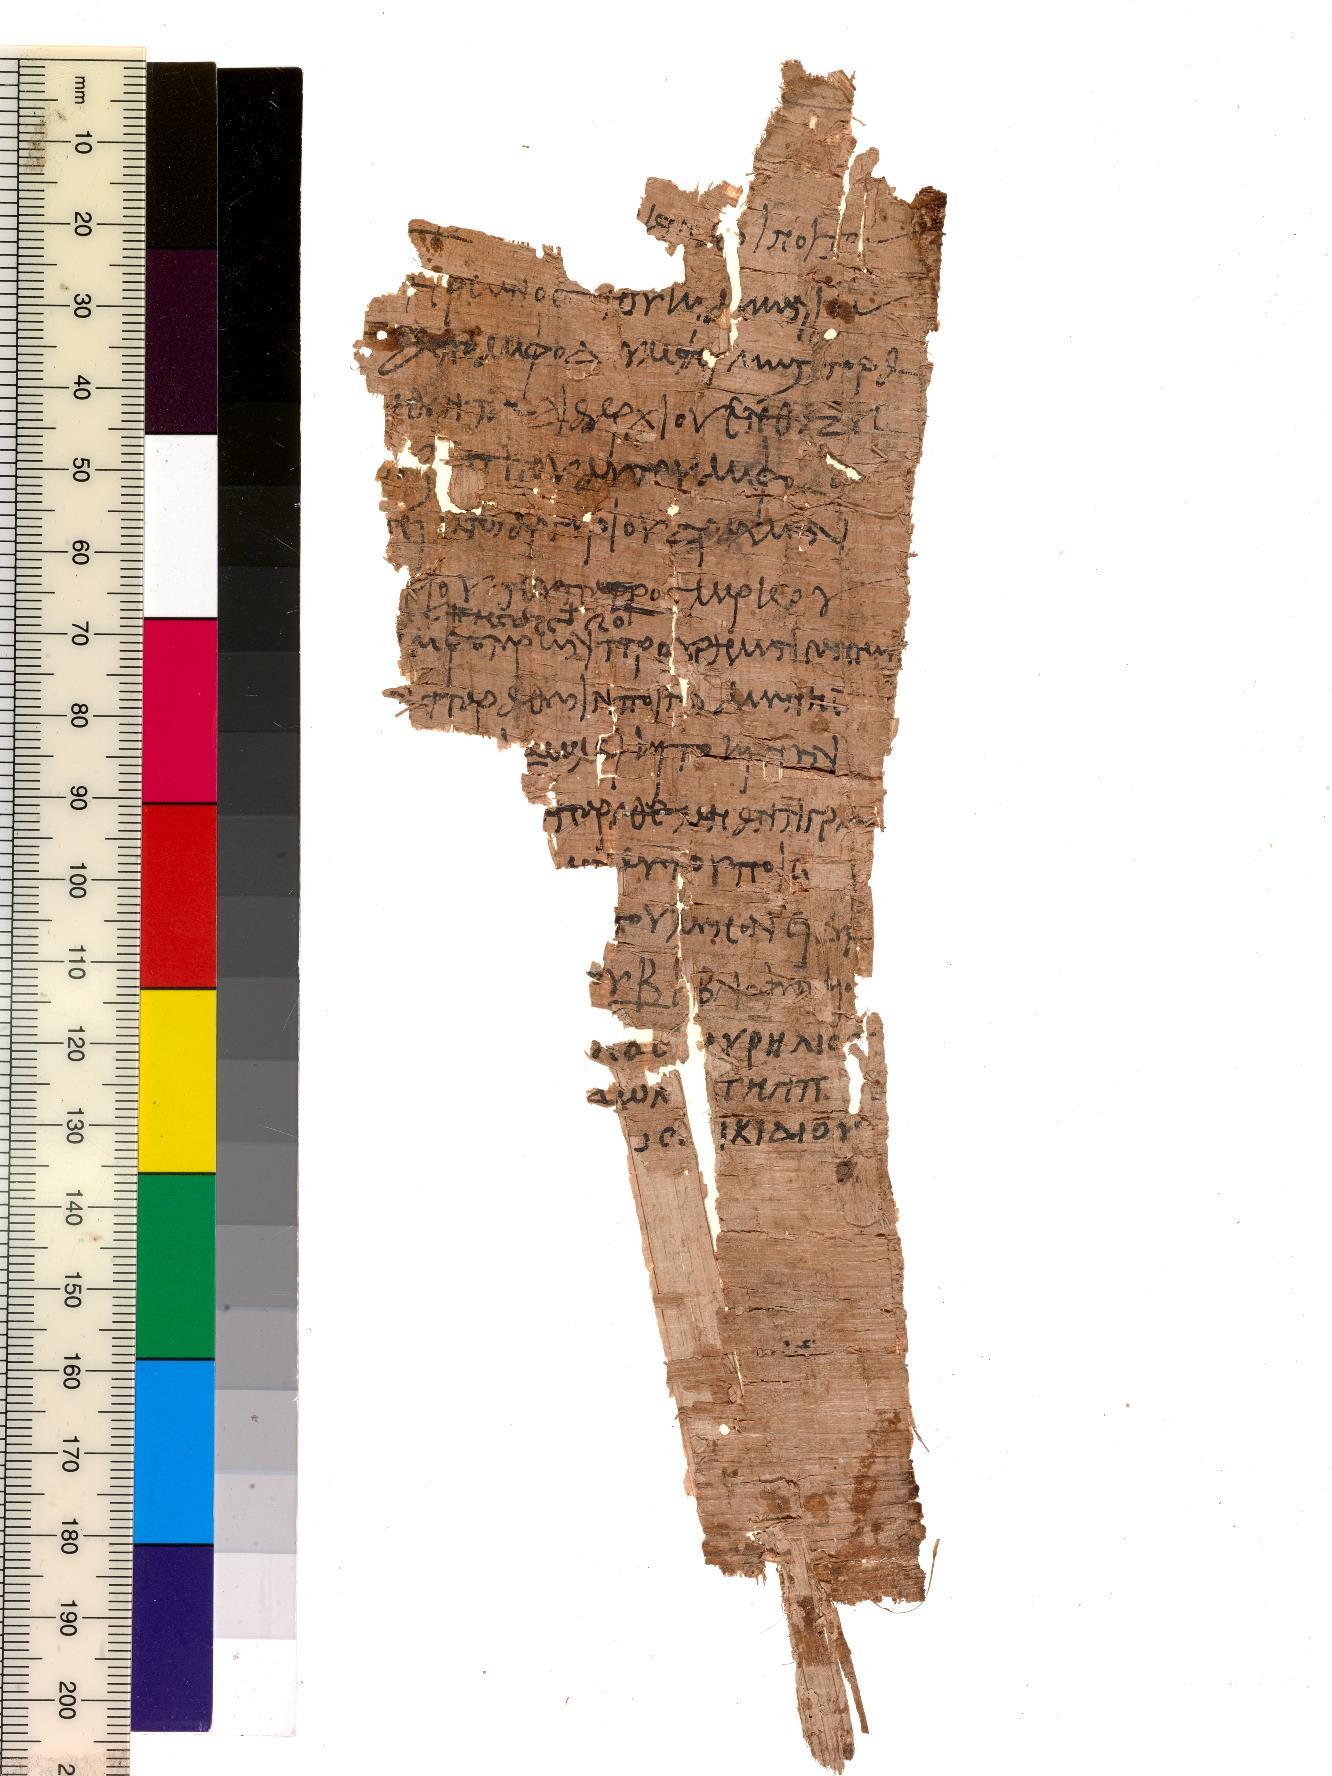 Papyrus fragment P.Mich.inv. 5451f. Photo by Randal Stegmeyer.